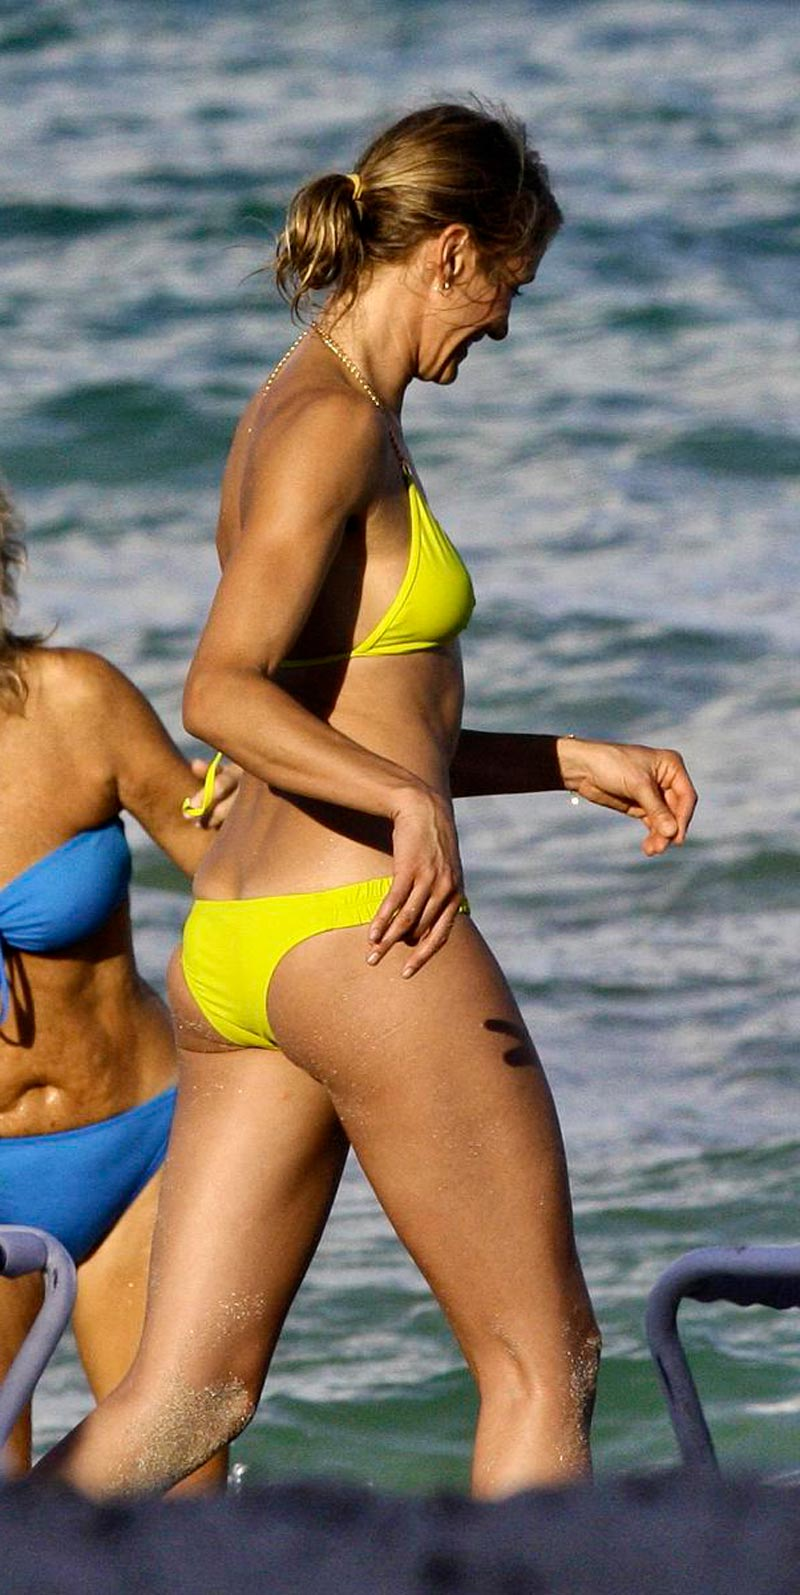 Cameron Diaz Fotos Bikini Playa Sexy 13